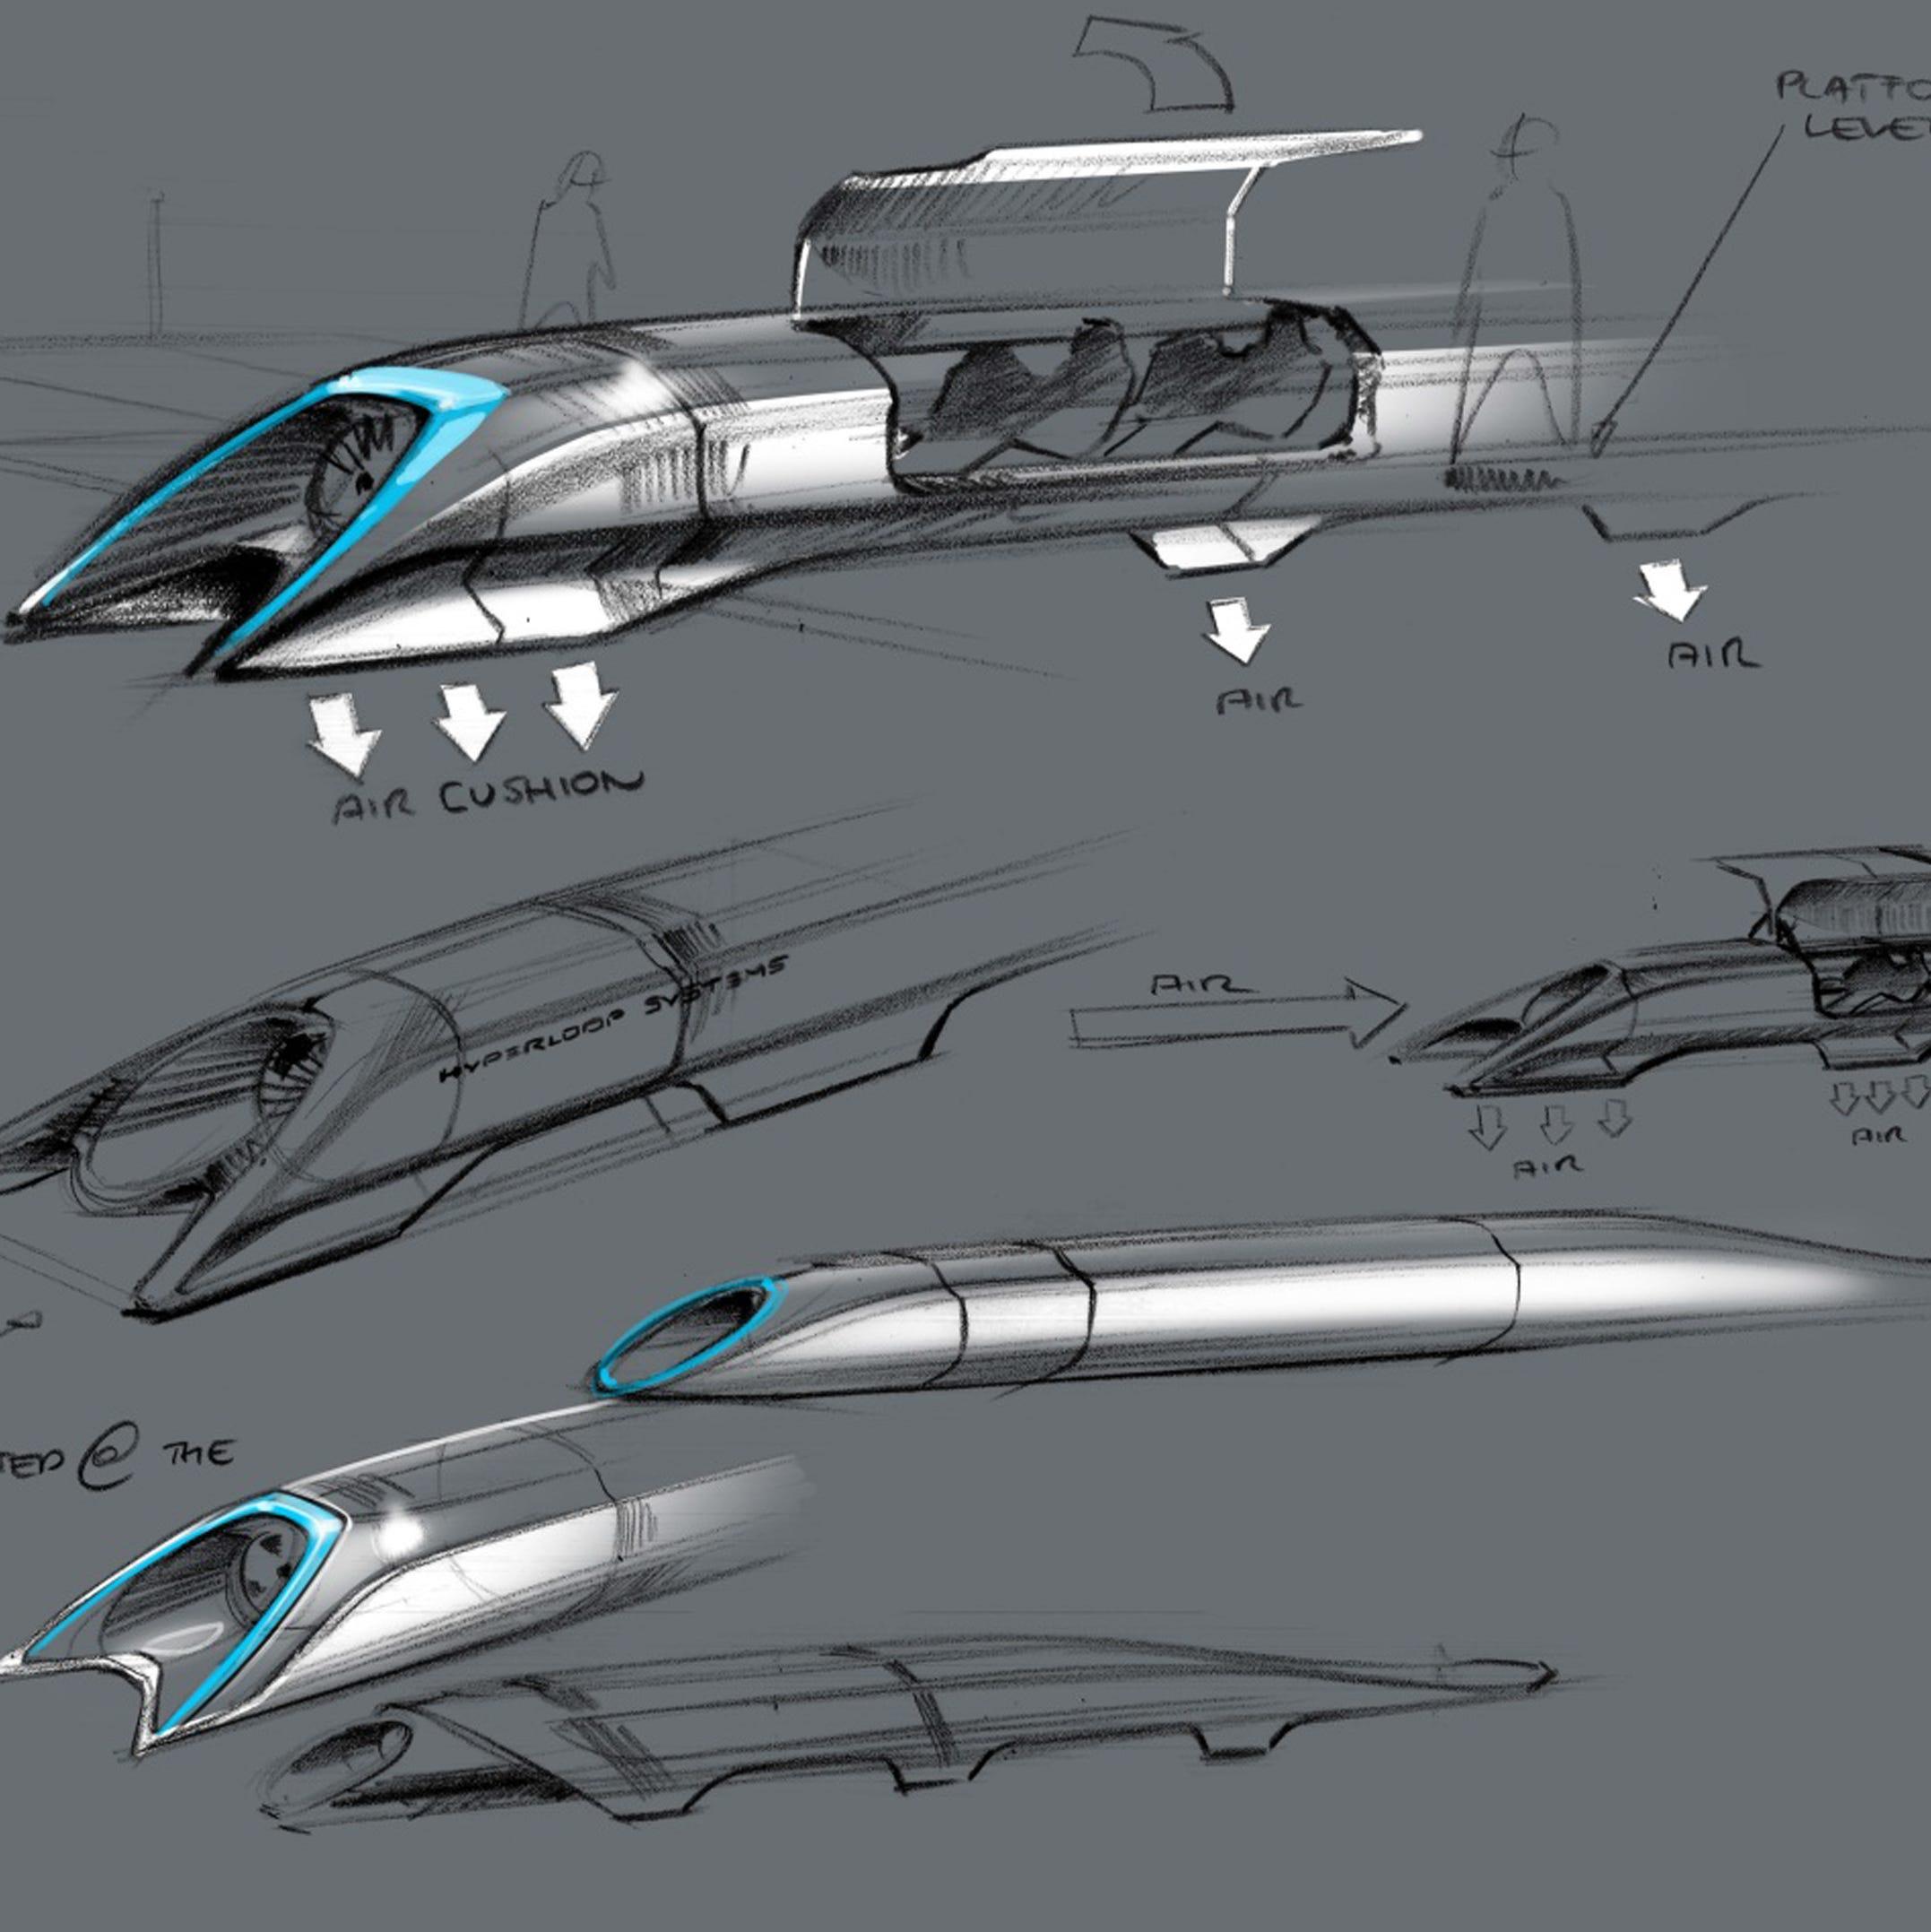 'Hyperloop' could put brakes to high-speed railways